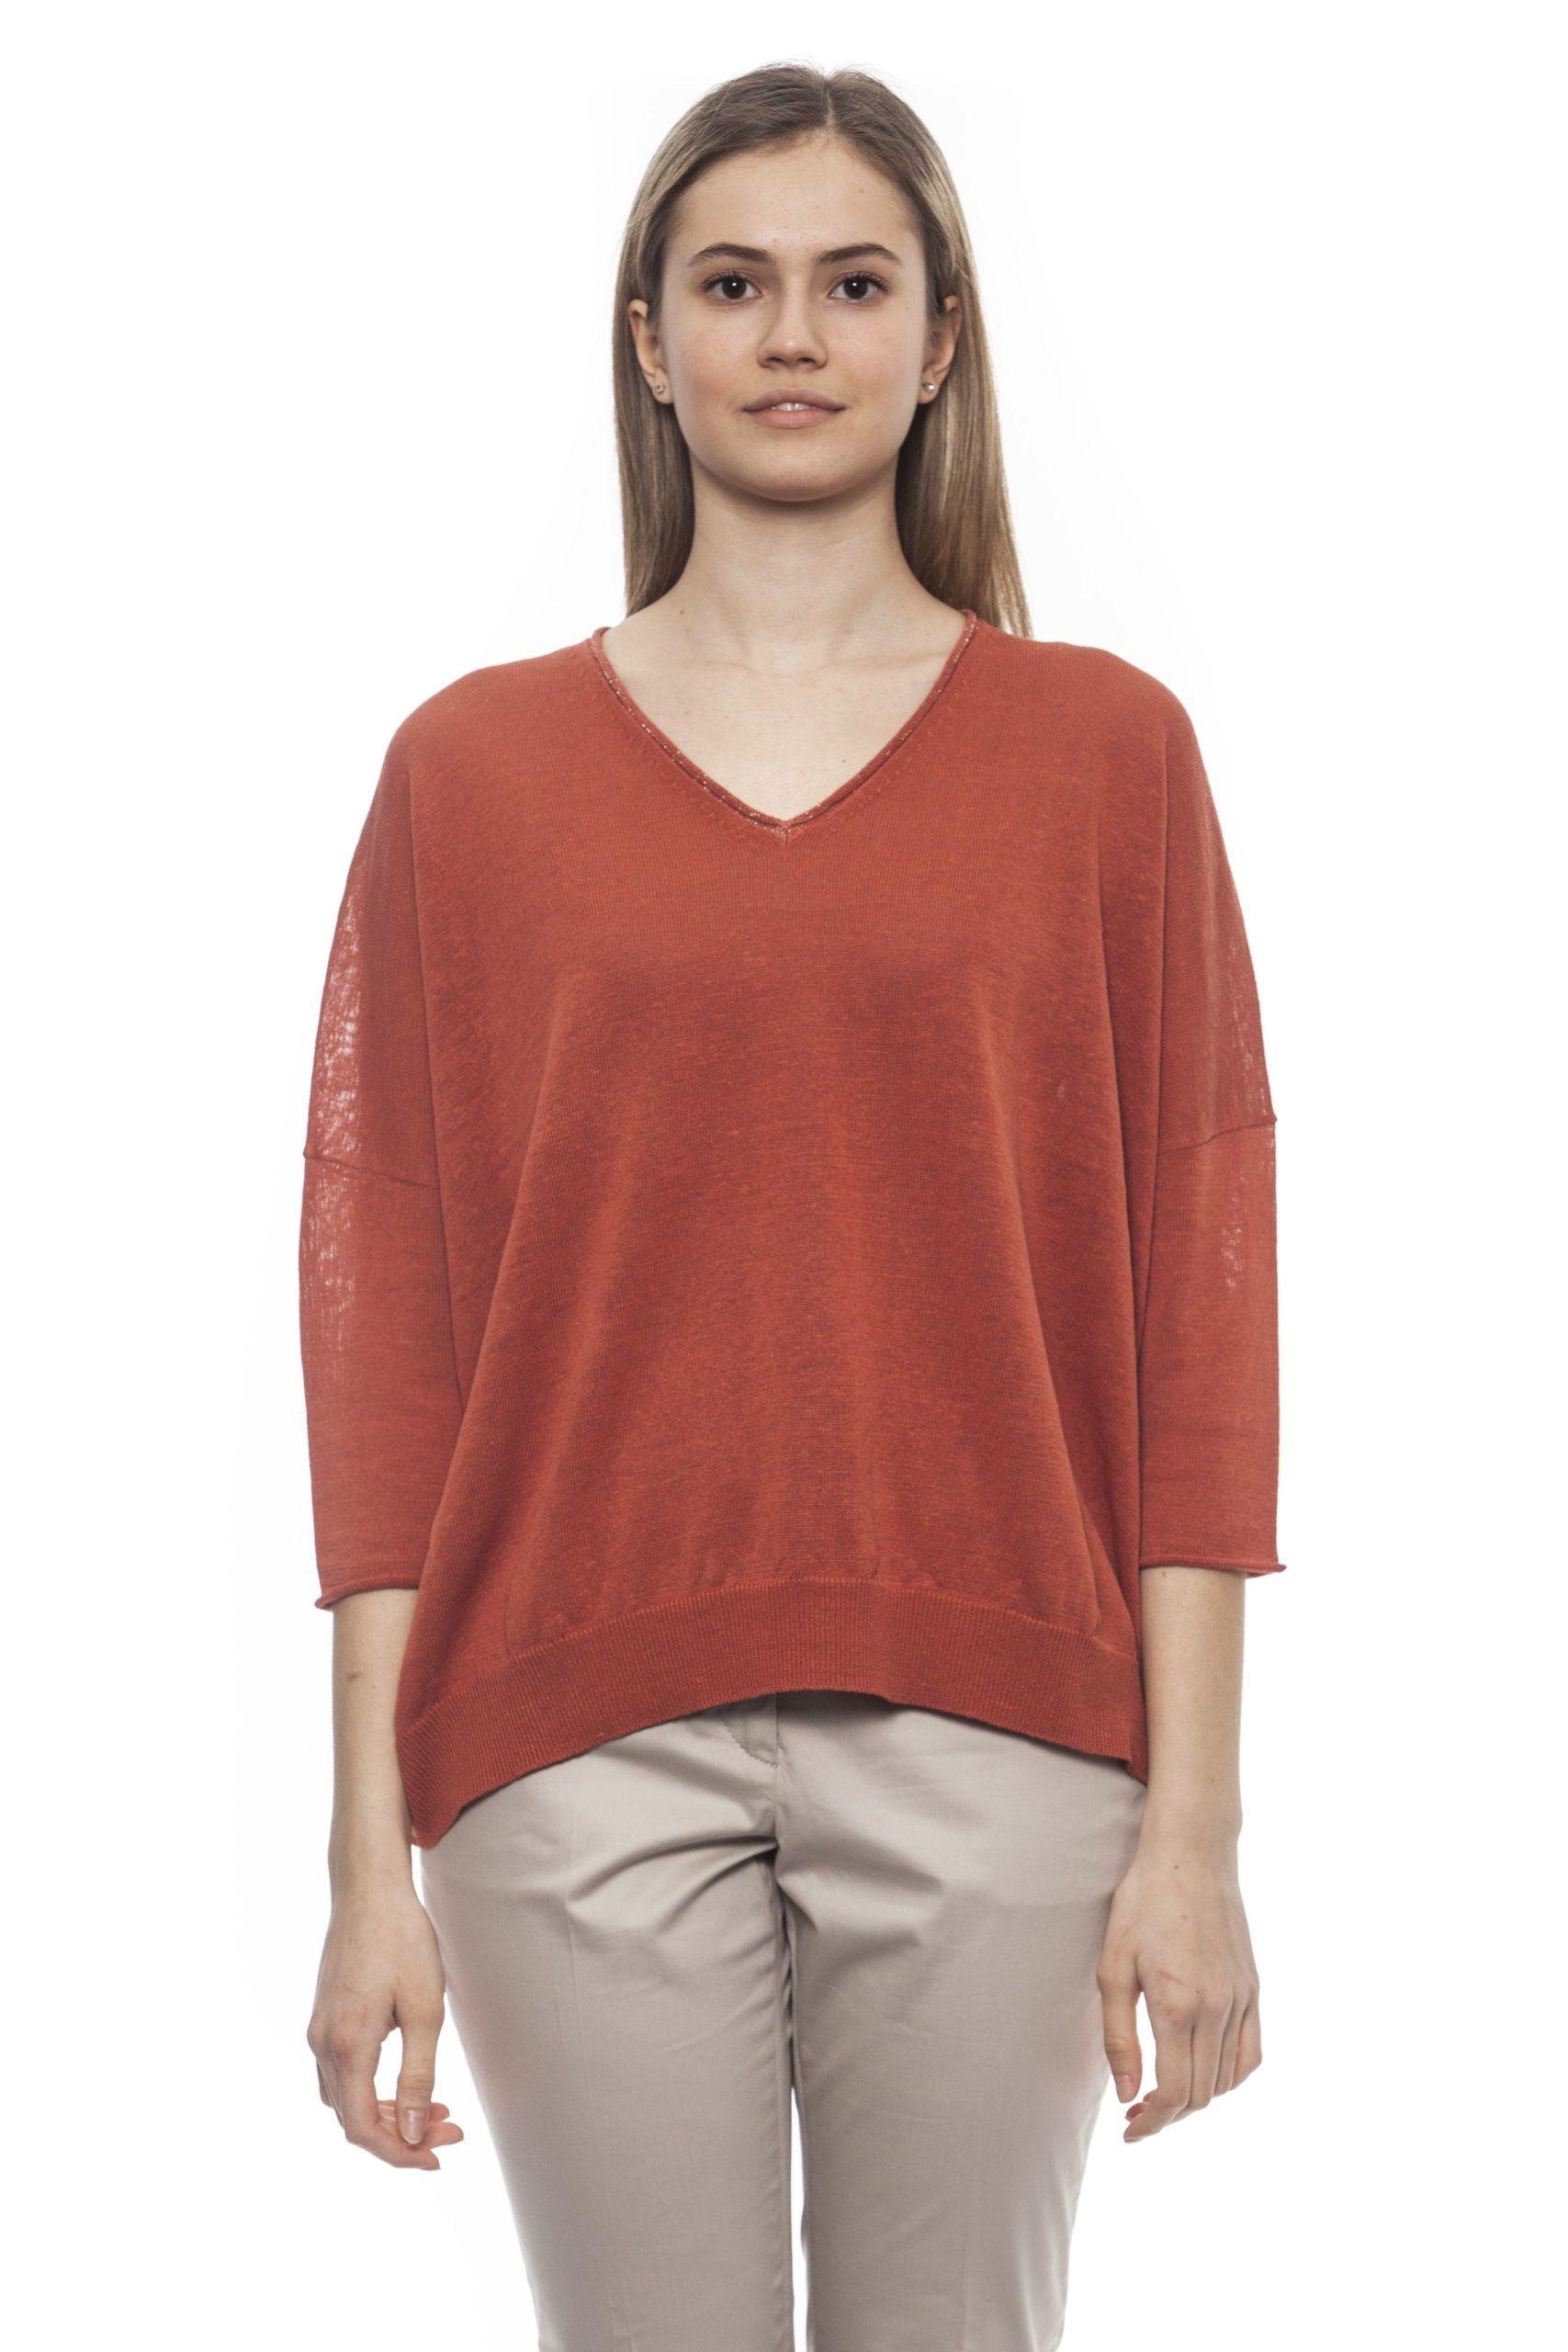 Peserico Women's S Marrone Sweater Brown PE1383124 - IT42 | S